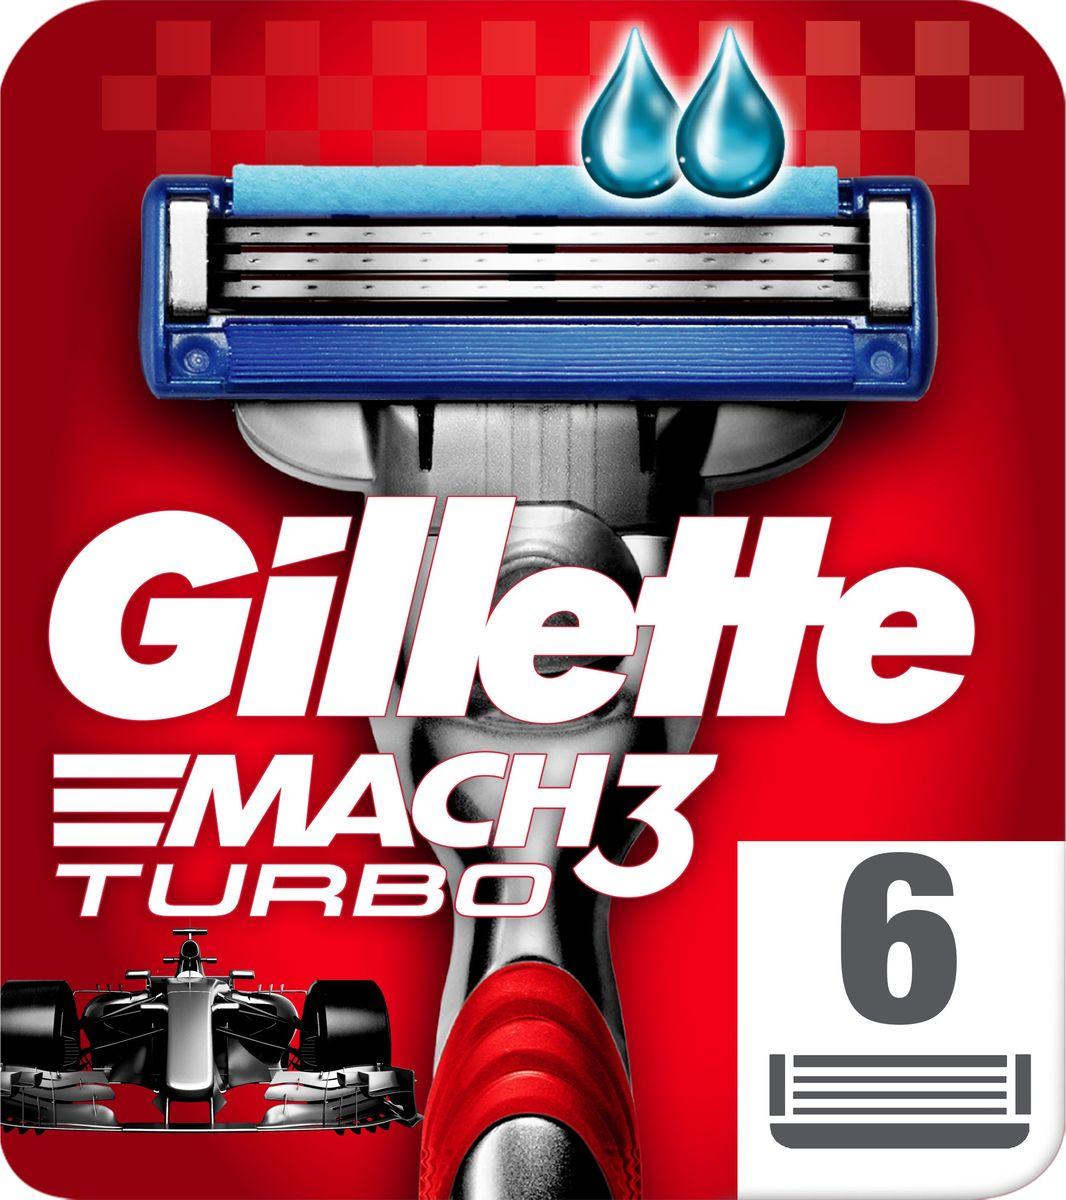 Сменные кассеты для бритв Gillette Mach3 Turbo, 6 шт